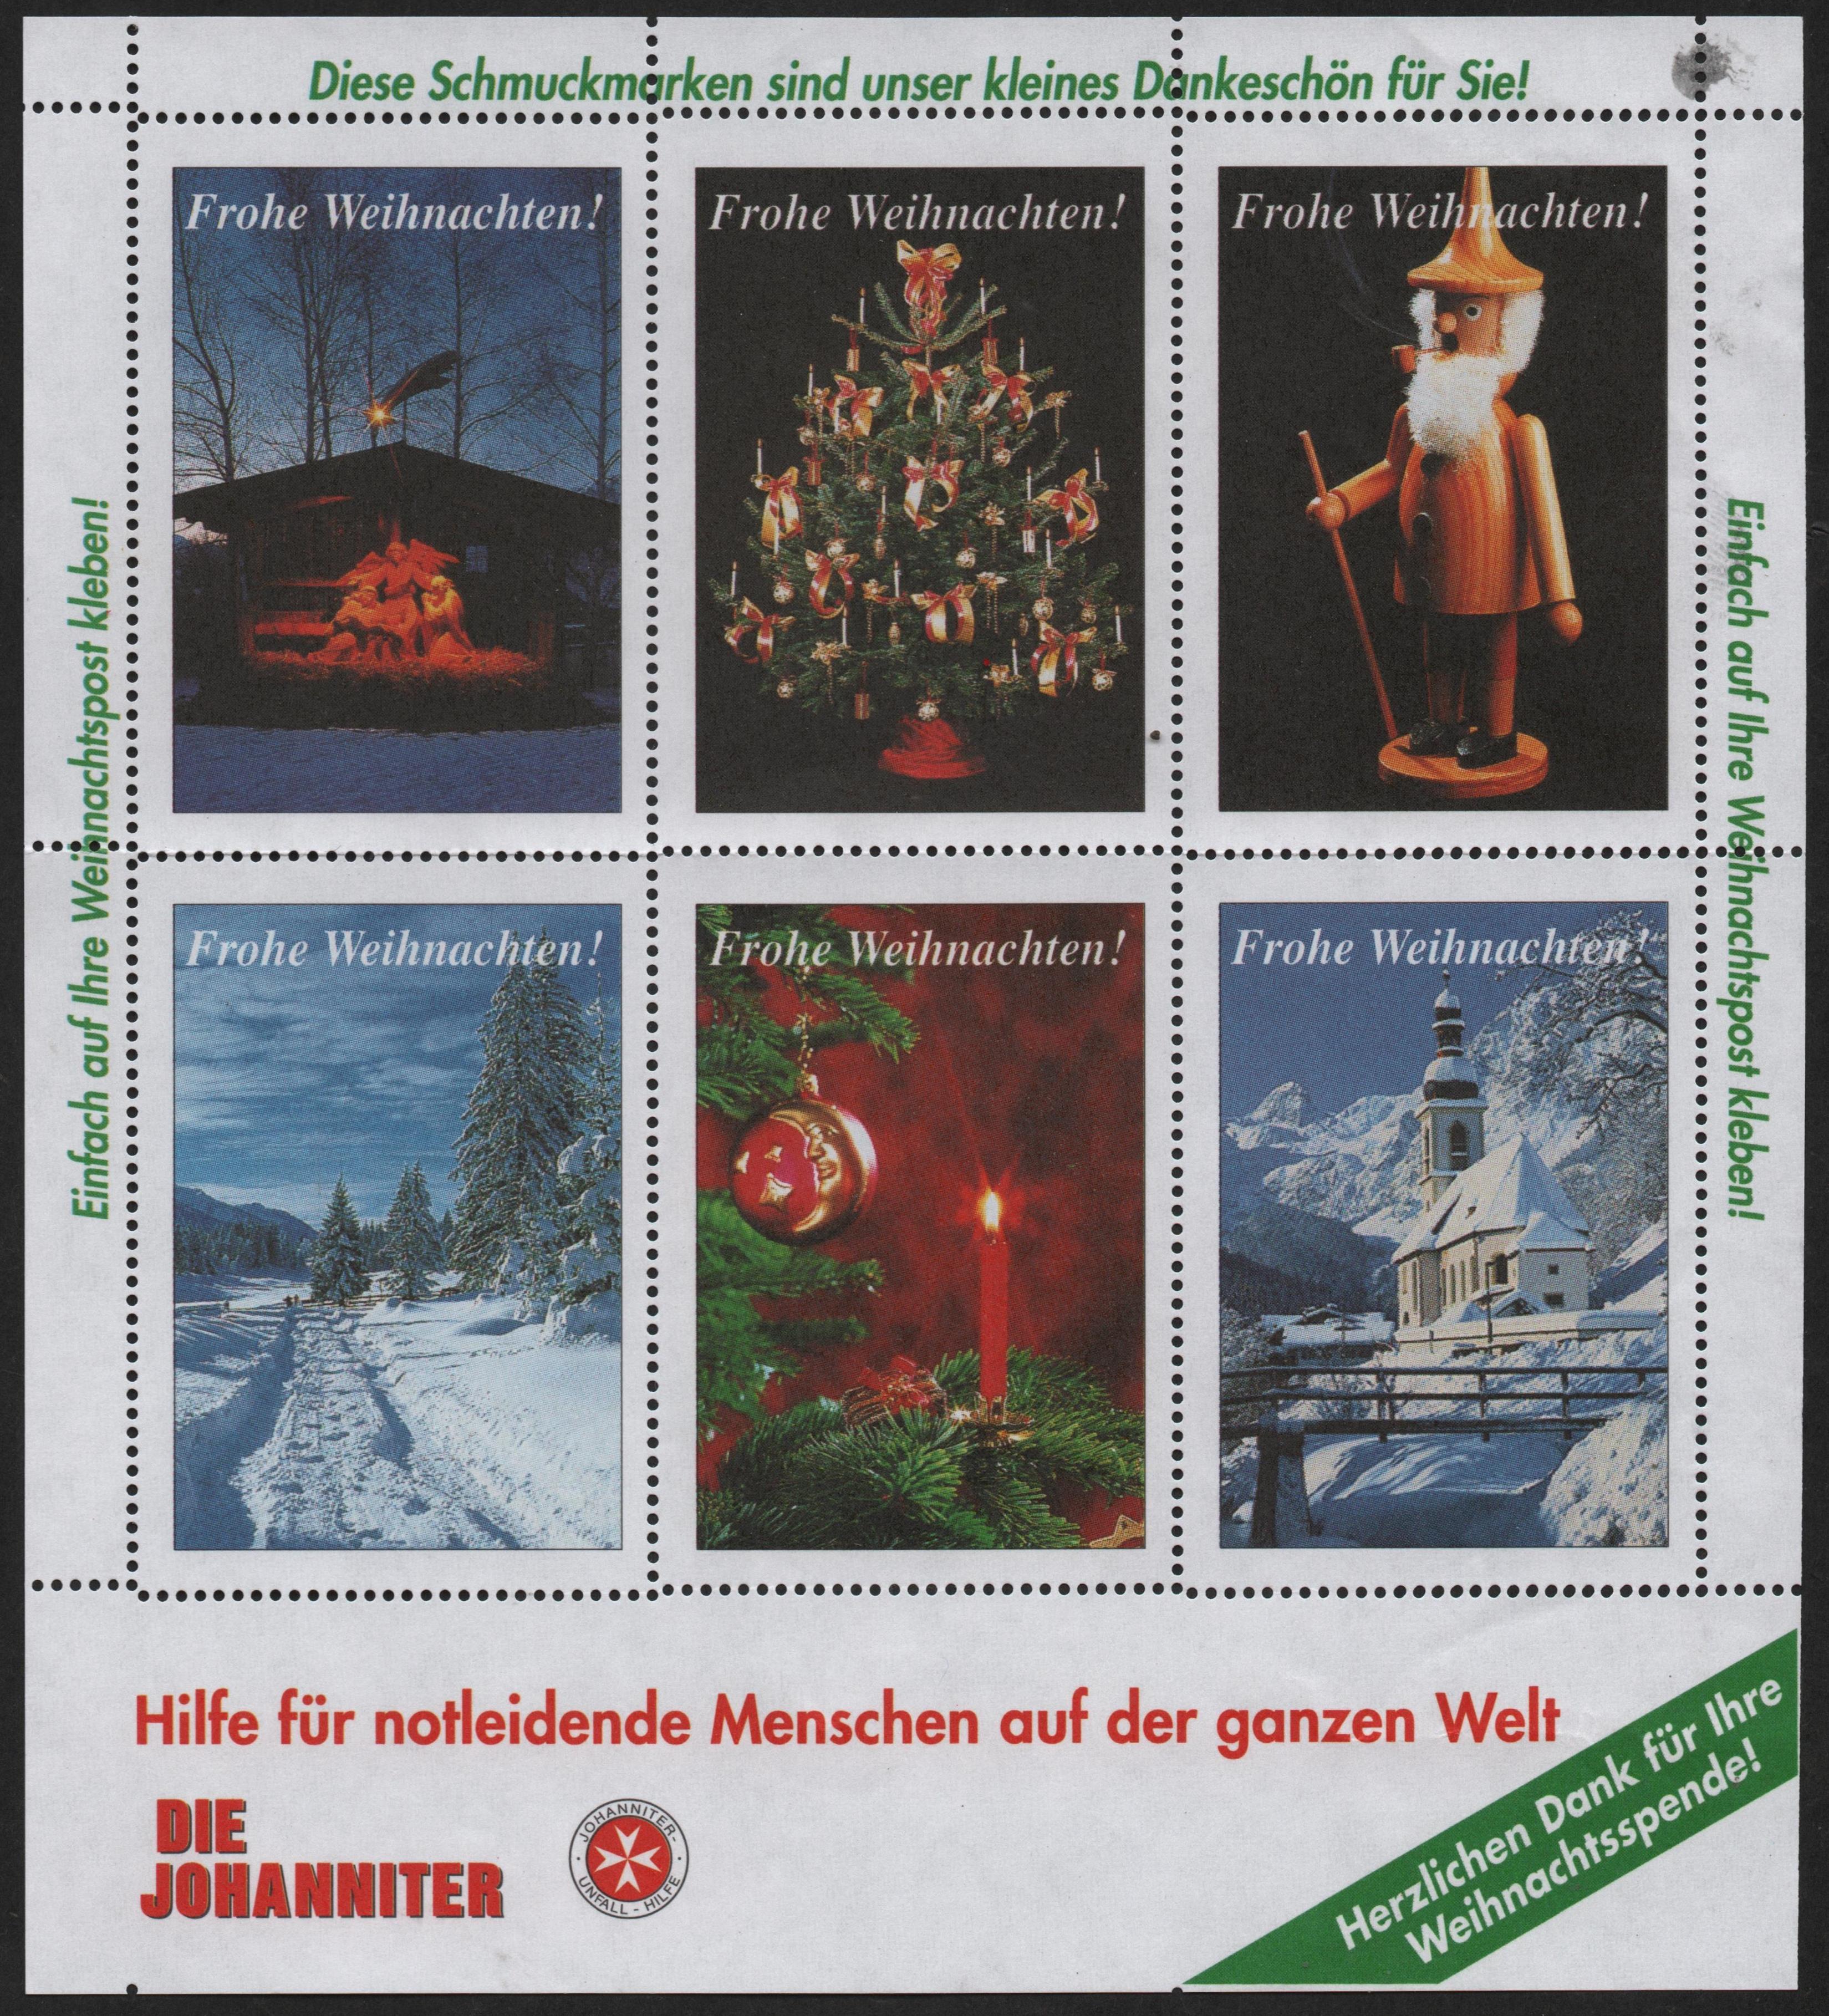 German Christmas charity seals